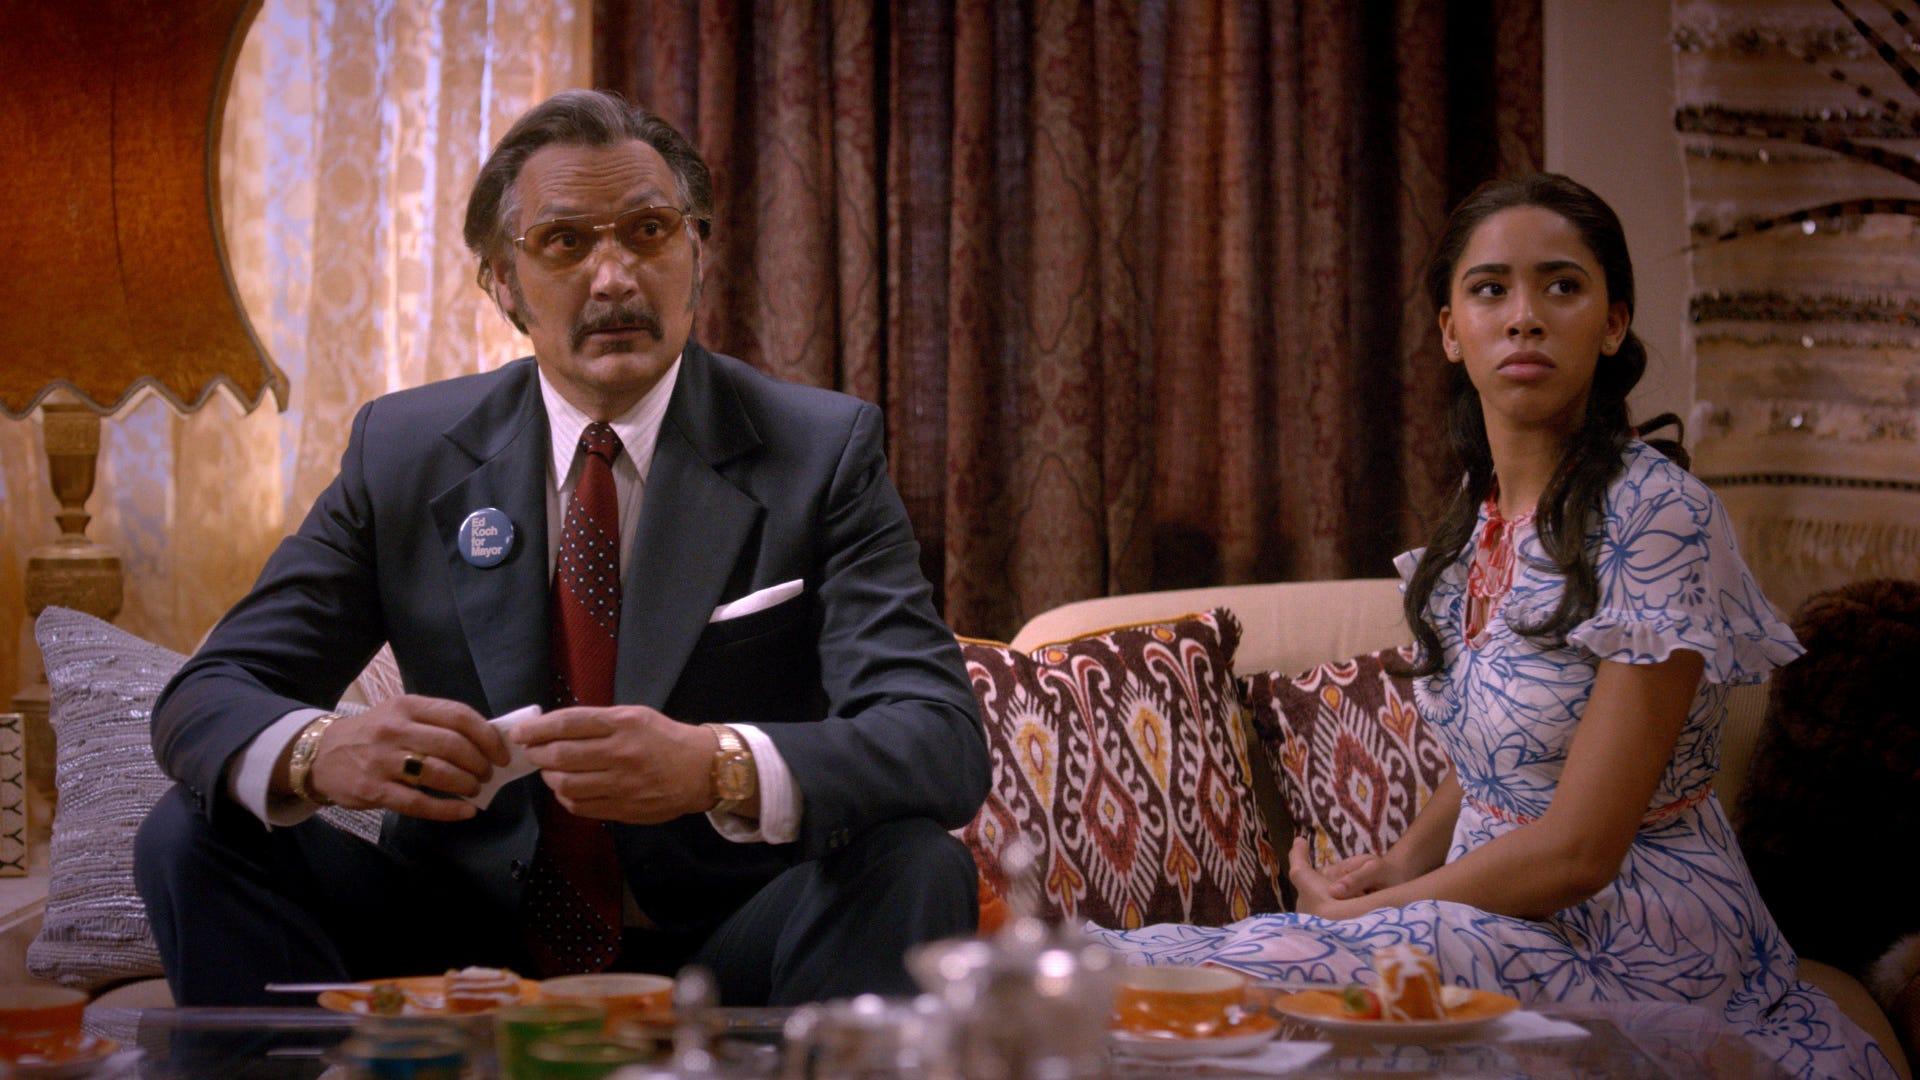 Jimmy Smits as Francisco Cruz and Herizen Guardiola as Mylene in The Get Down